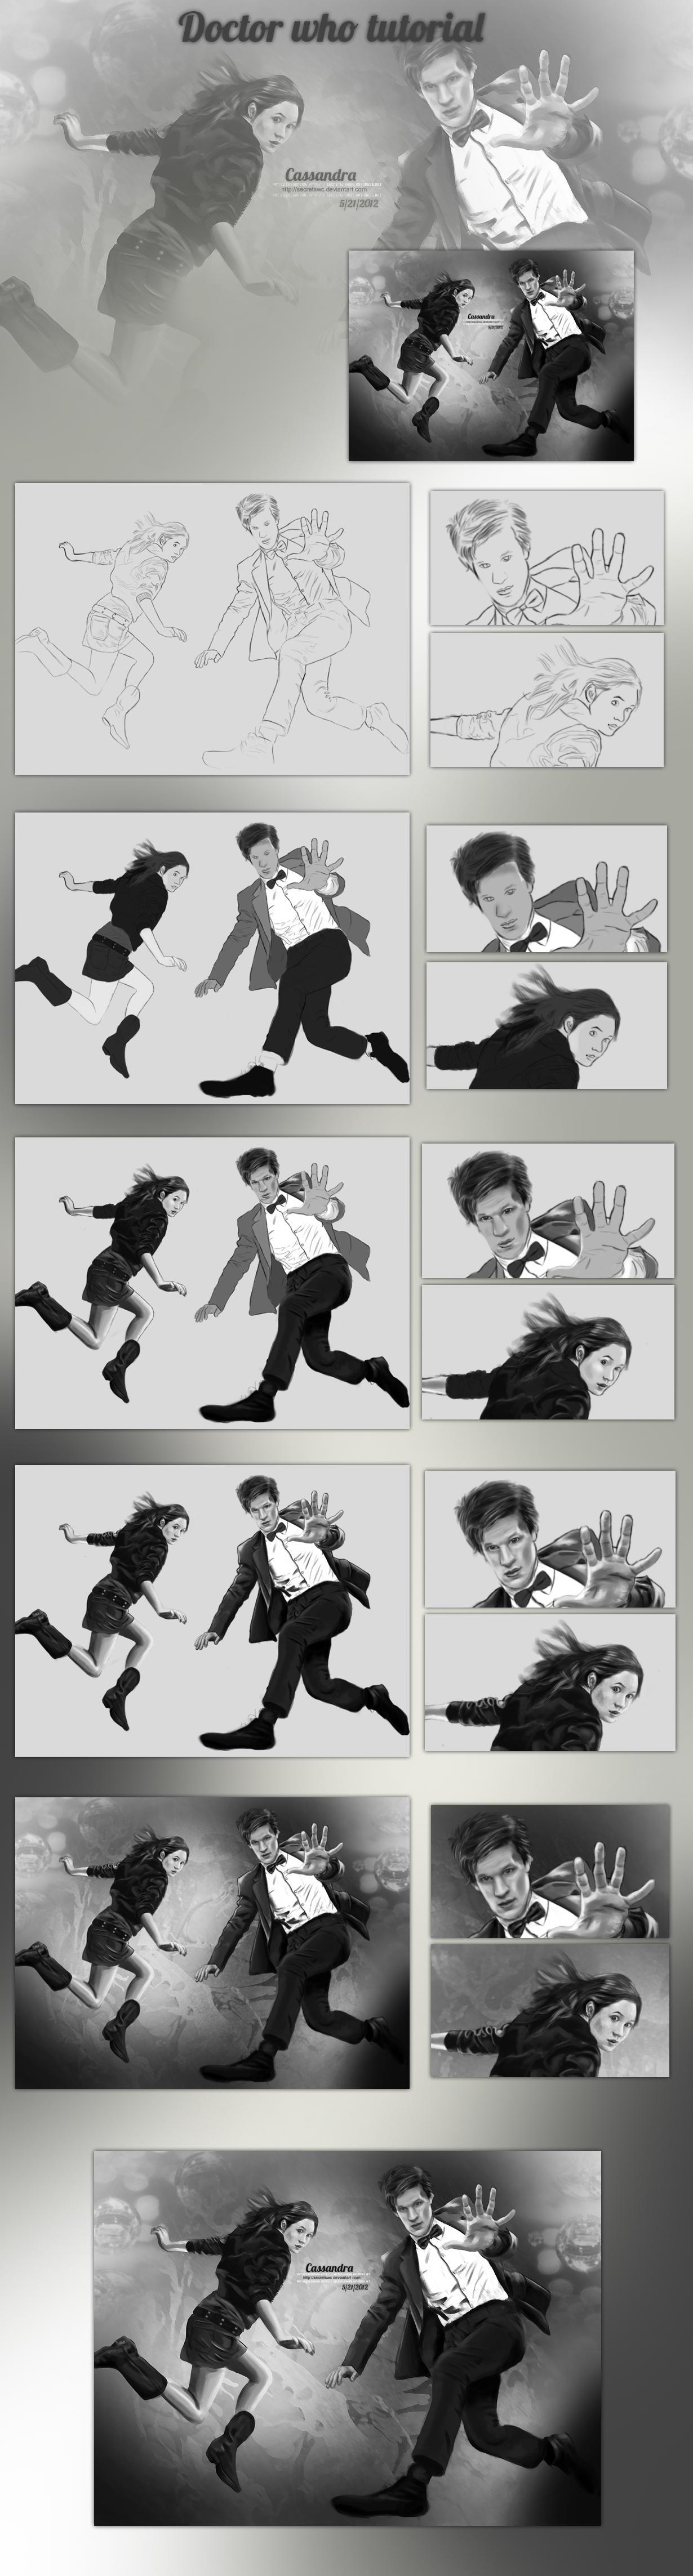 Doctor Who tutorial by secretSWC